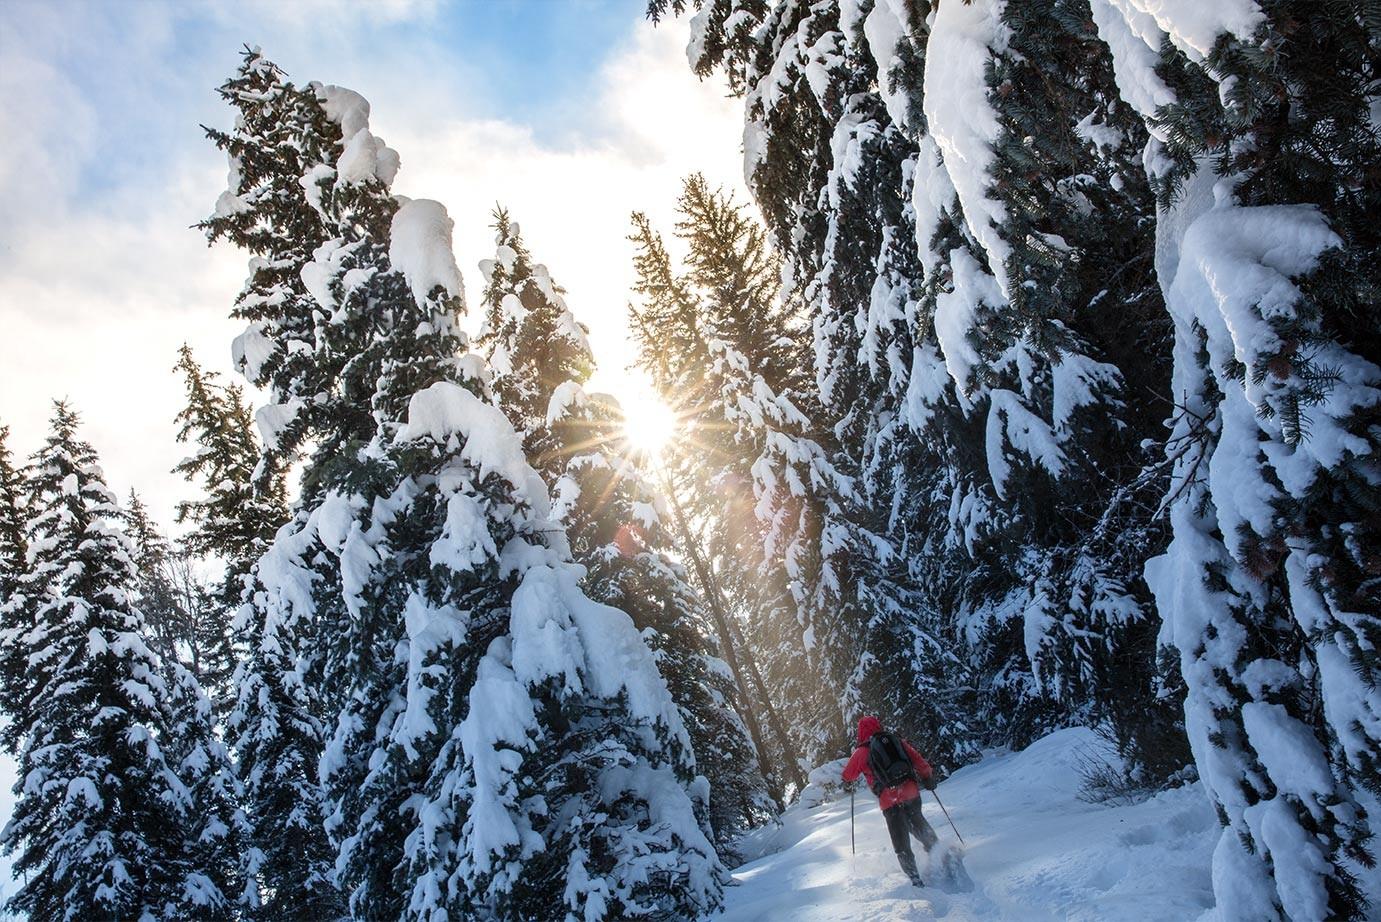 snowshoeing-trees-sun-web-1381x922.jpg